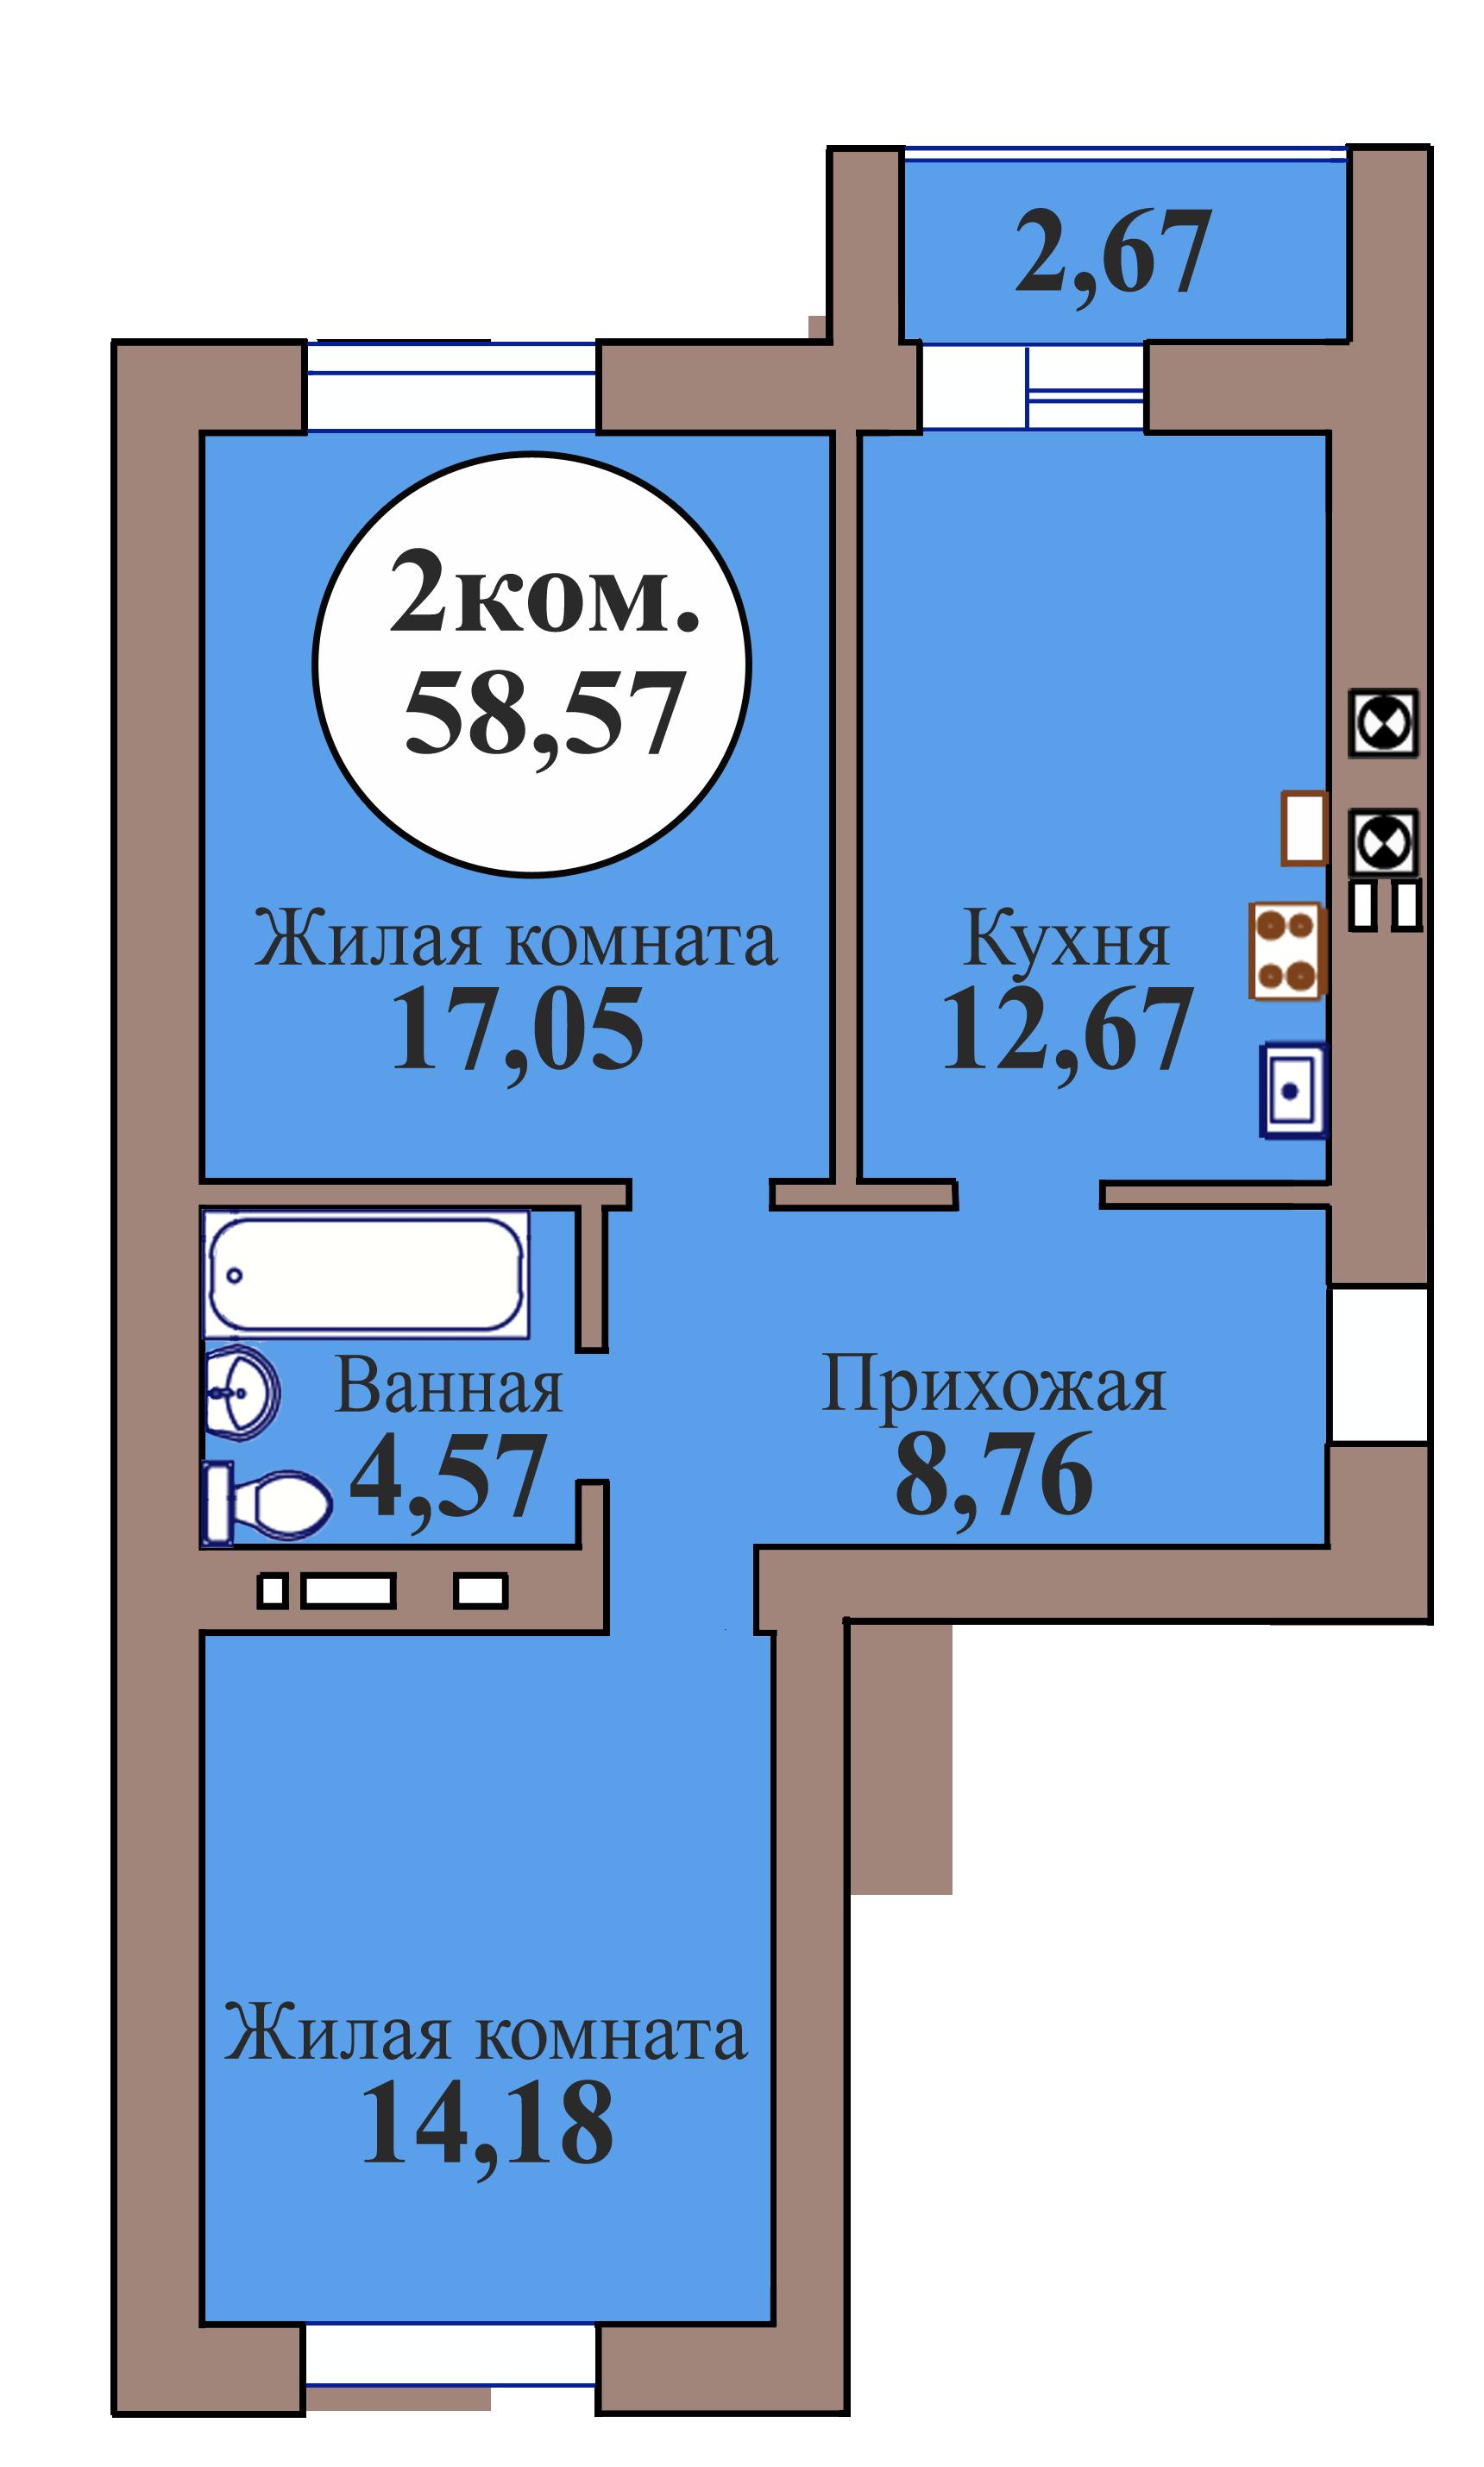 2-комн. кв. по пер. Калининградский, 5 кв. 103 в Калининграде